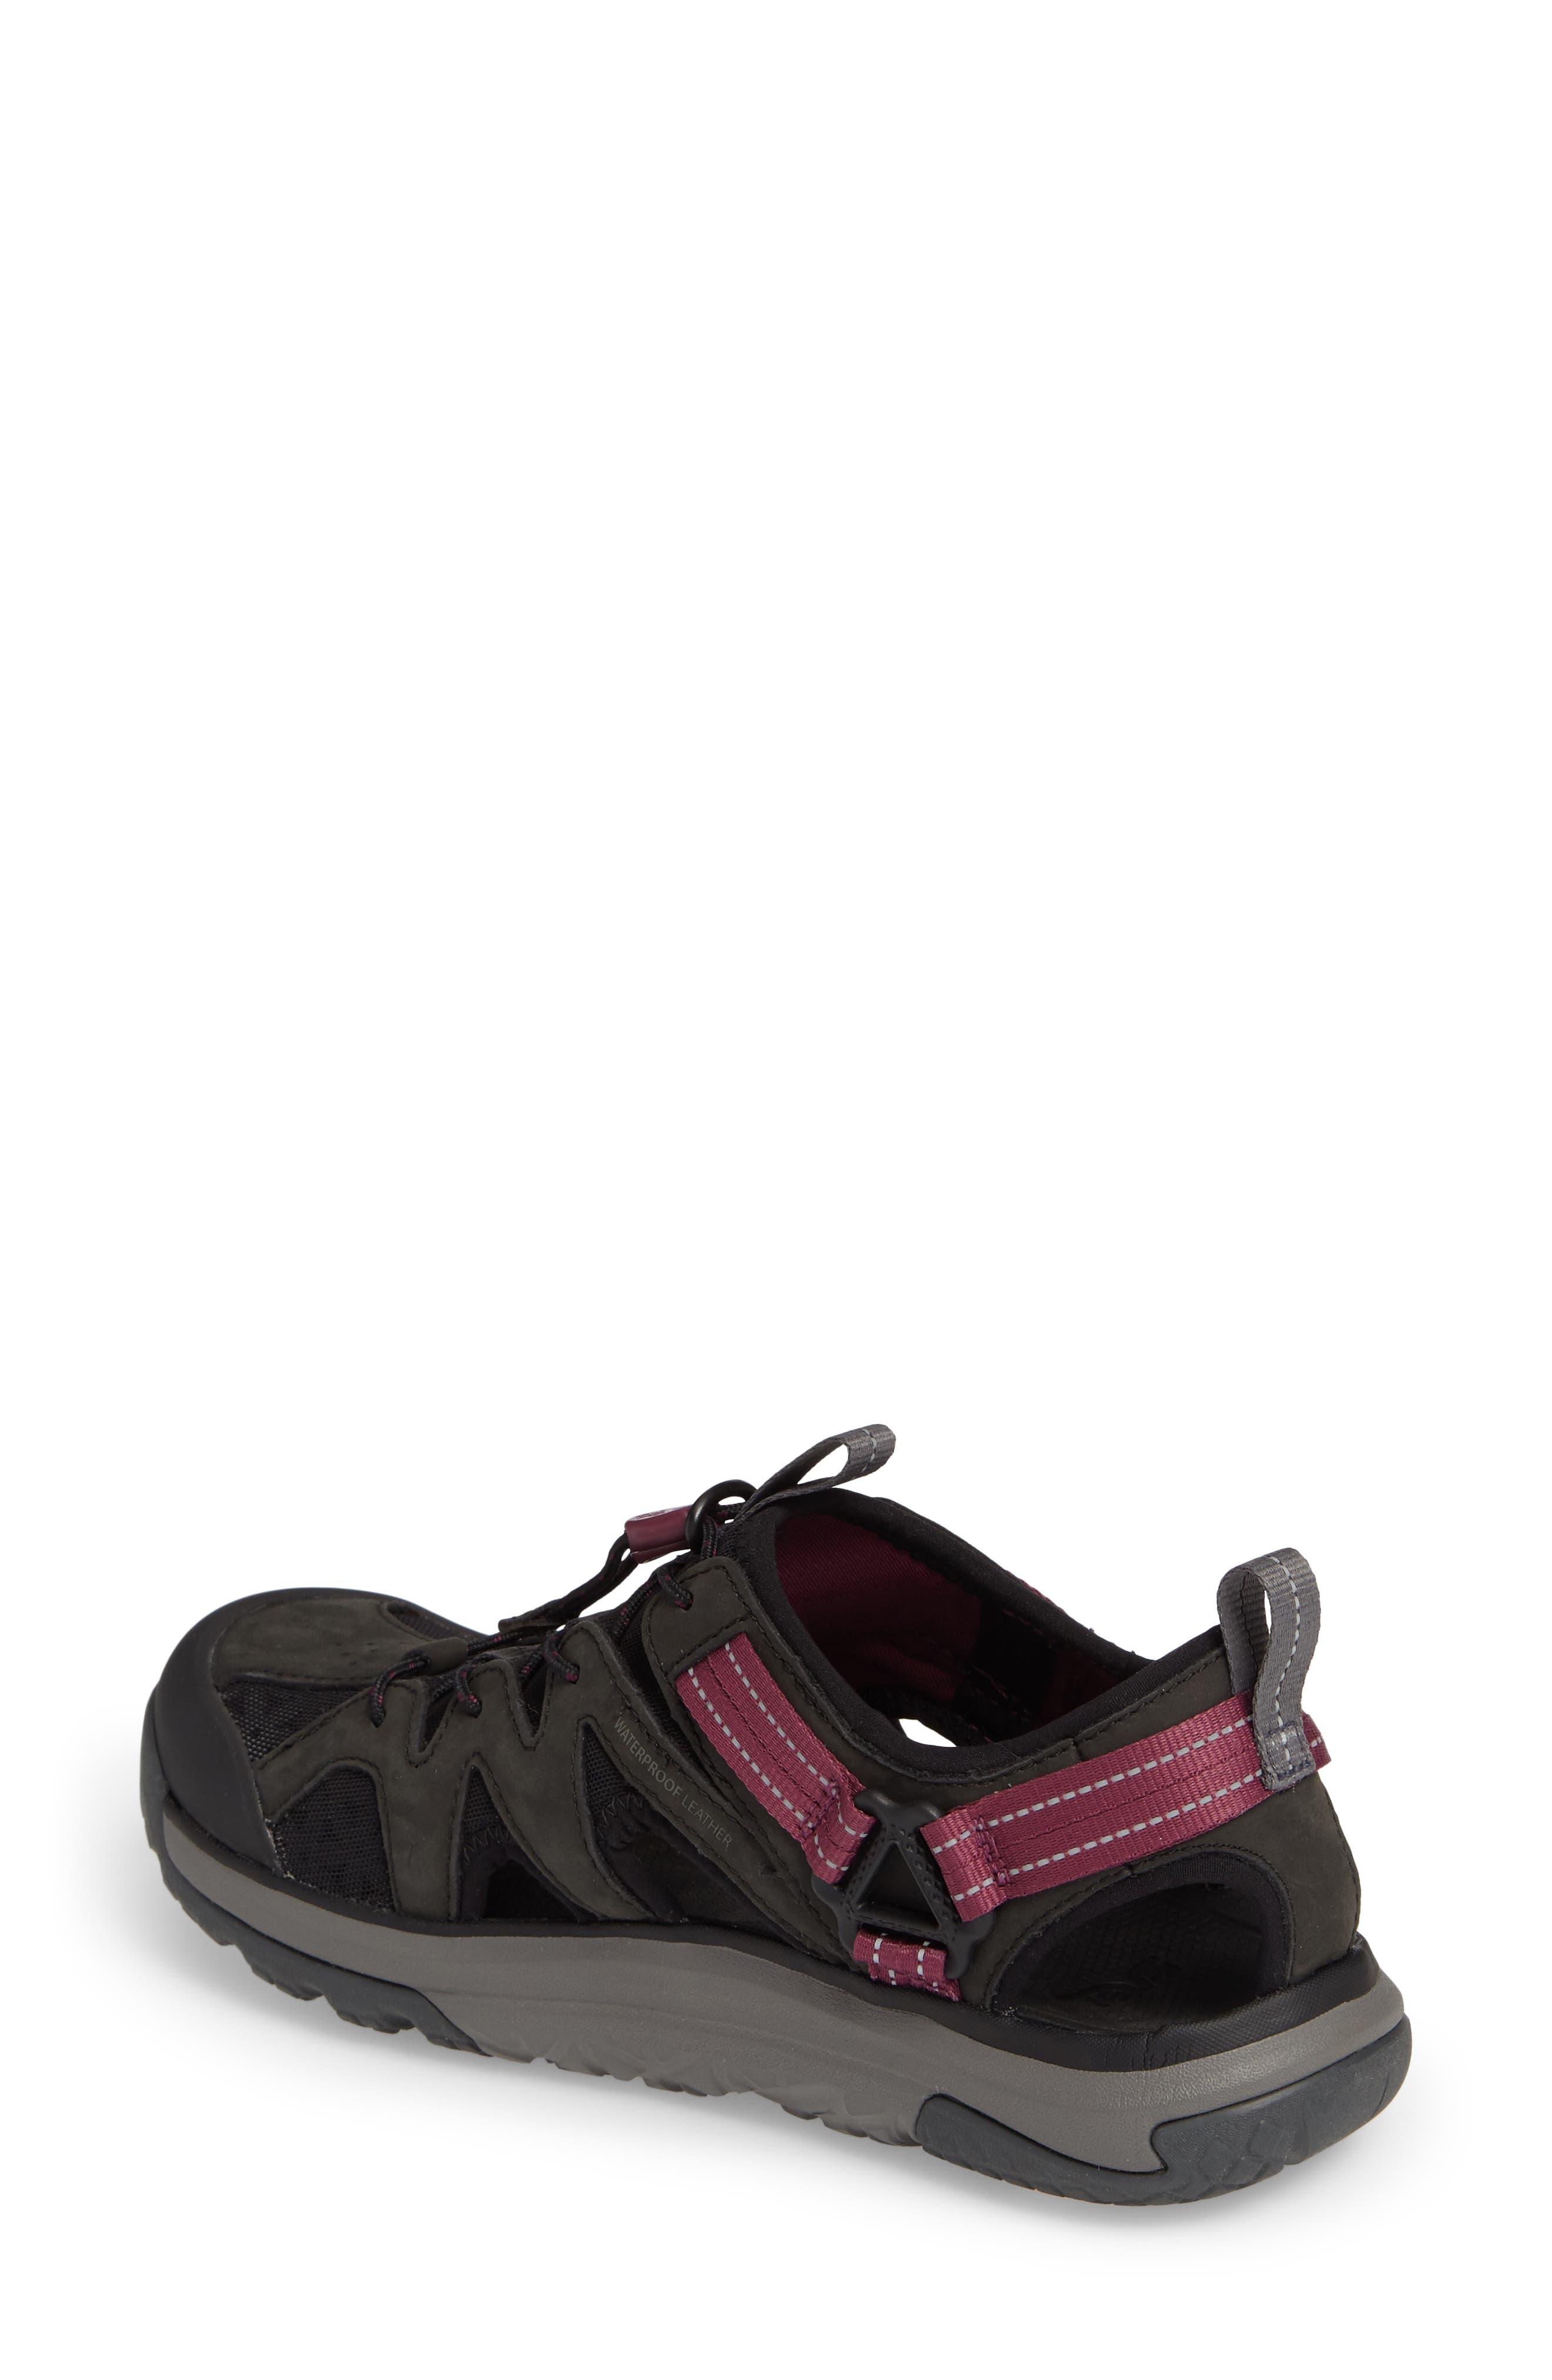 Terra Float Active Sandal,                             Alternate thumbnail 5, color,